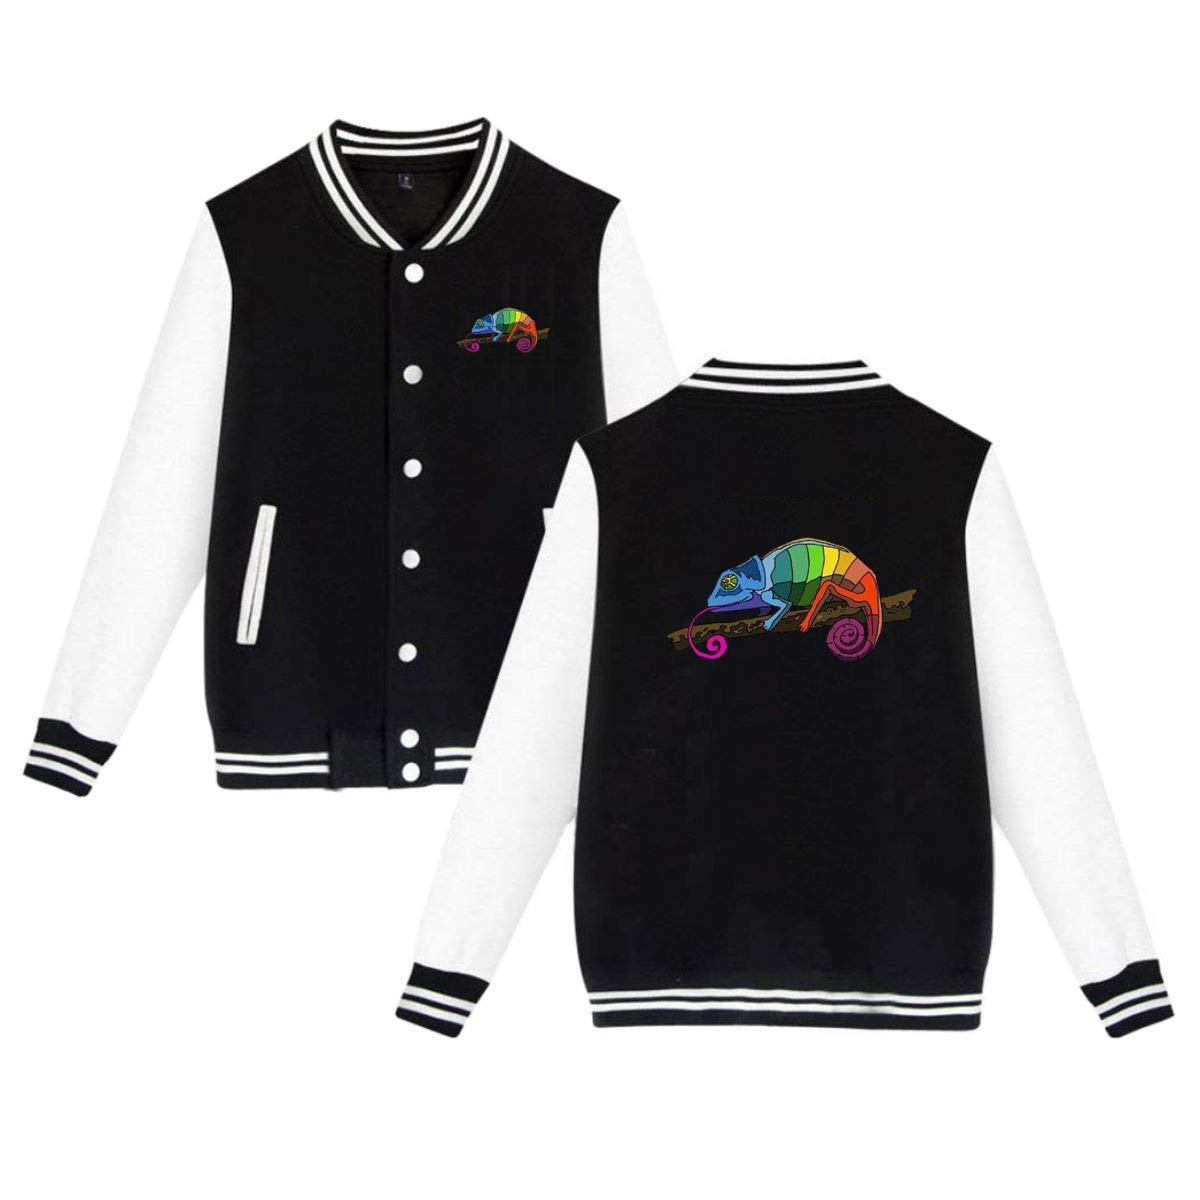 MEILOP Unisex Colorful Chameleon Baseball Jacket Uniform Sweater Coat